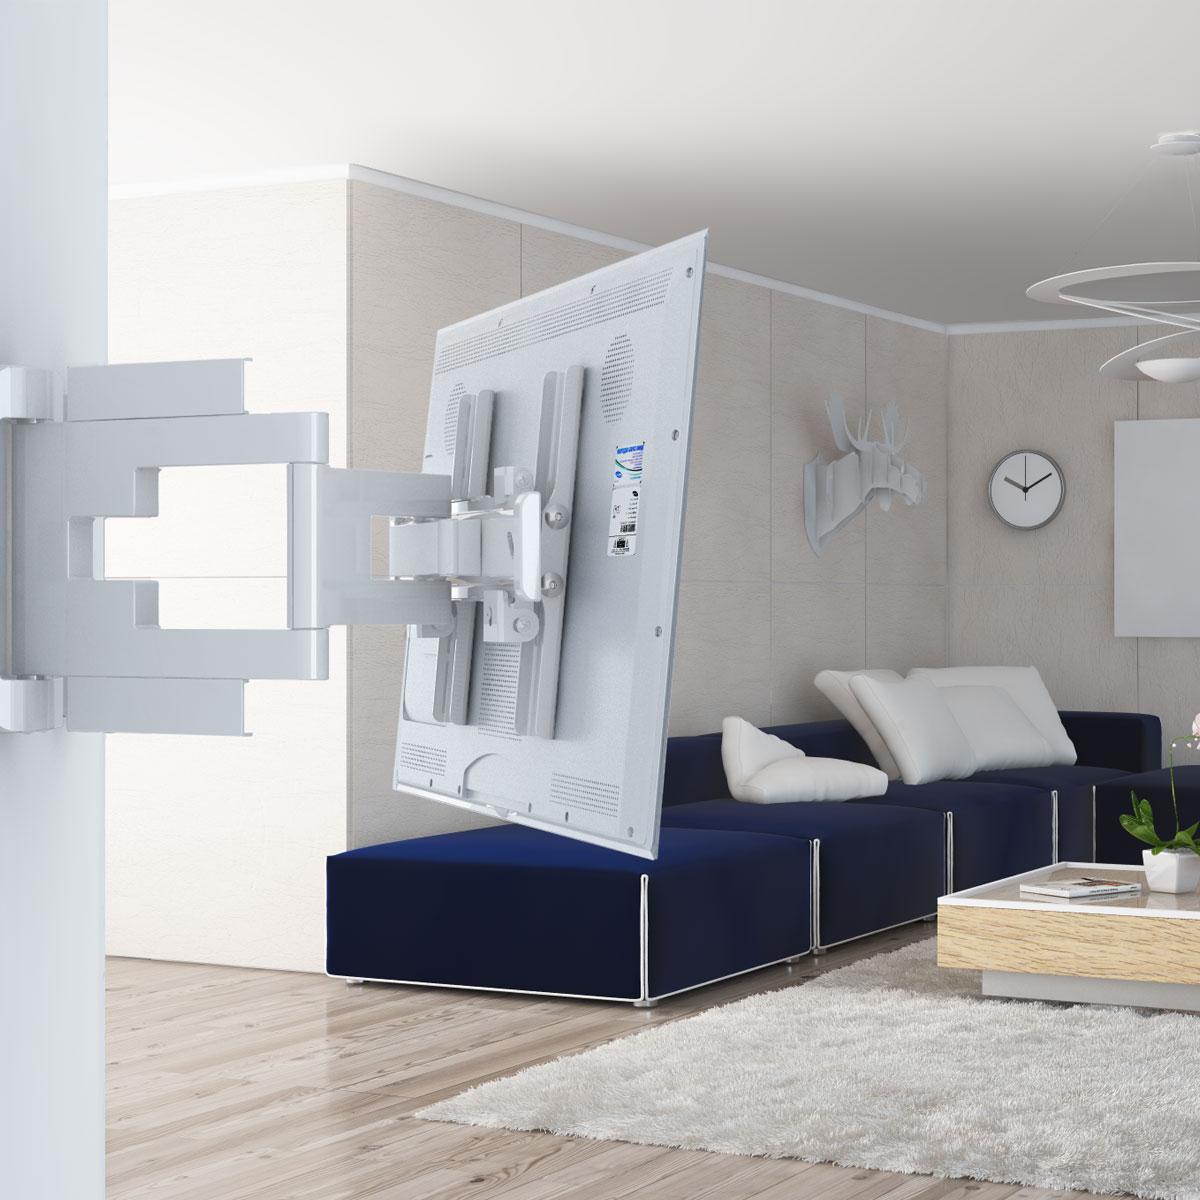 Holder LEDS-7015, White кронштейн для ТВ